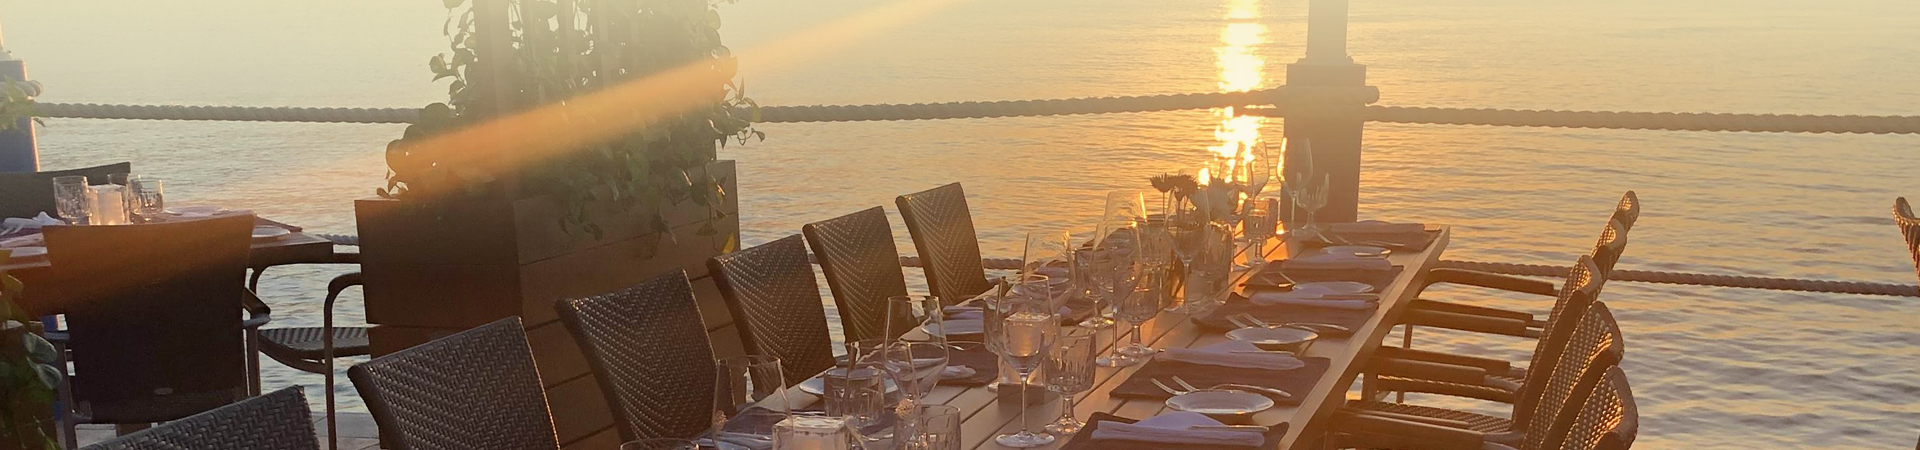 Corporate Events Testimonials Banner - The Wharf Restaurant & Bar